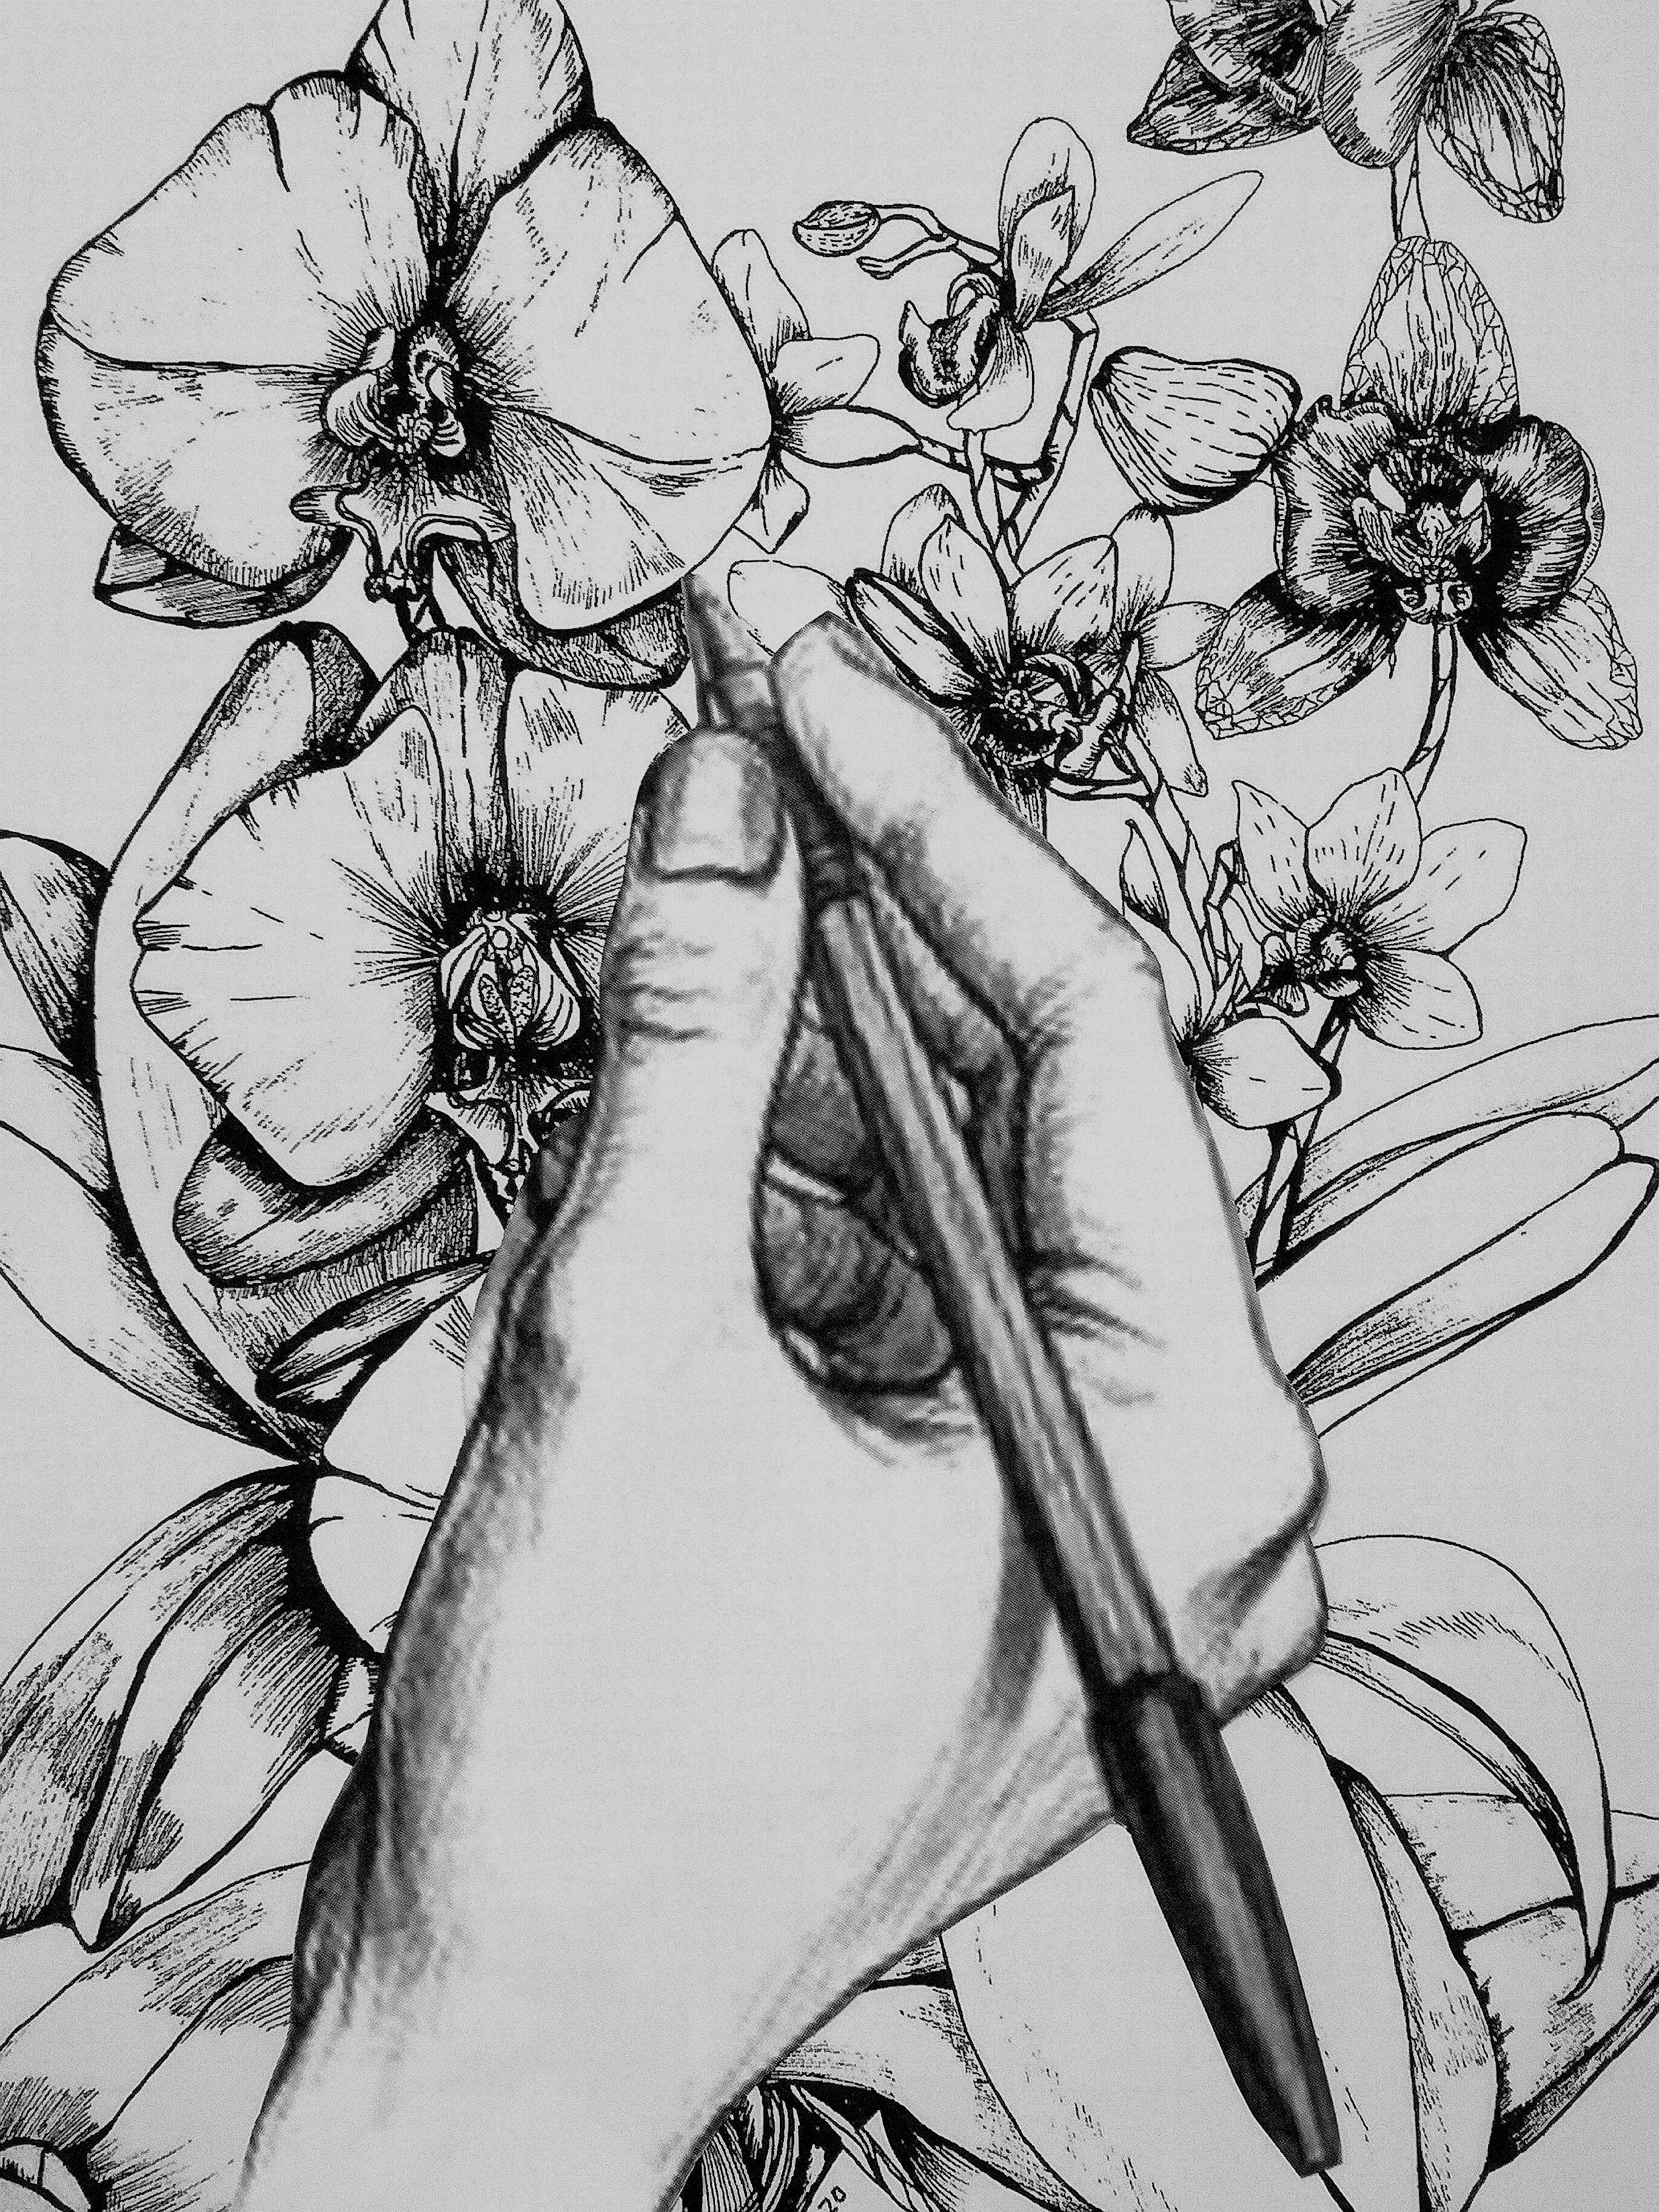 Sketching Workshop with Moira Milne